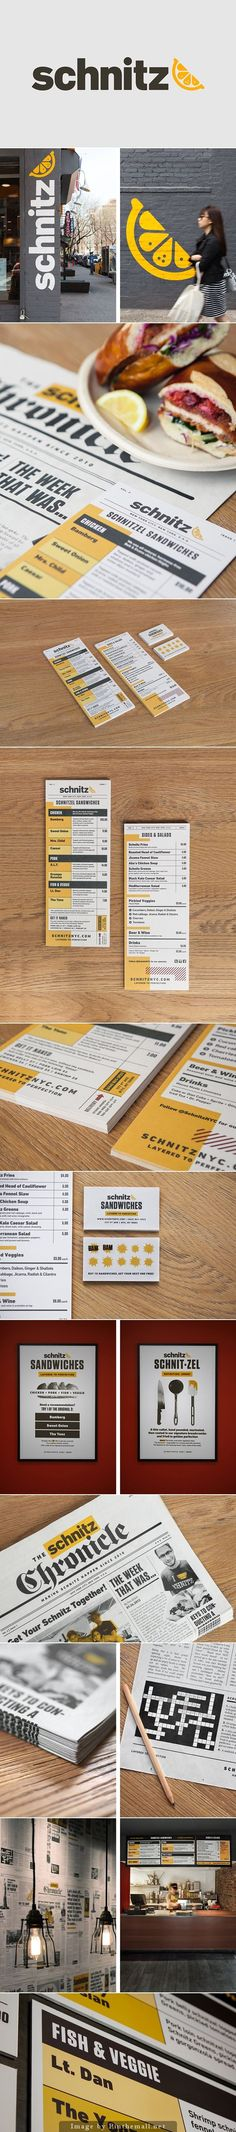 Schnitz Branding, Graphic Design, Print Design By Tag Collective